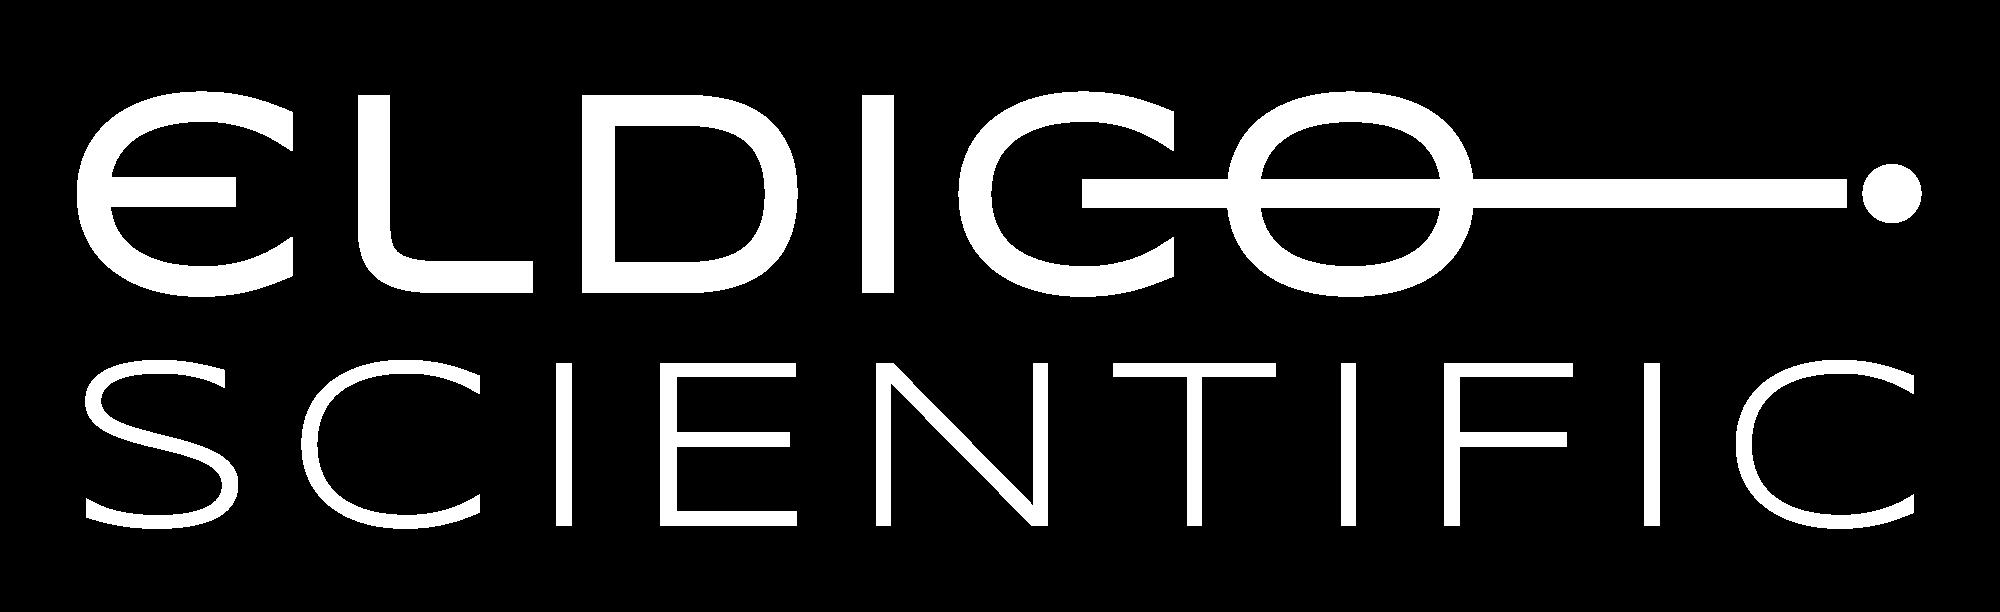 LOGO-ELDICO-weiss-1